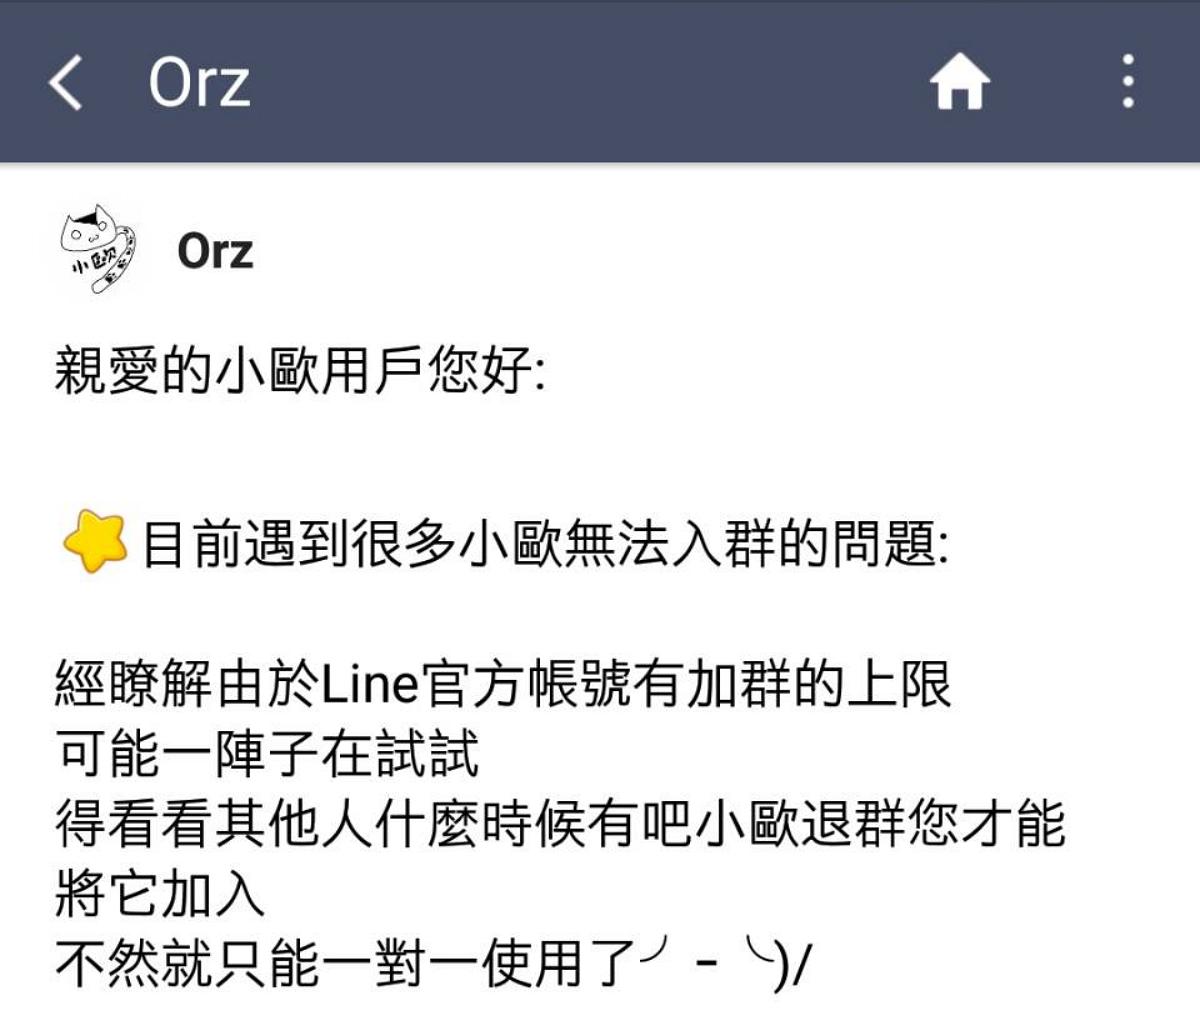 LINE ORZ 聊天機器人